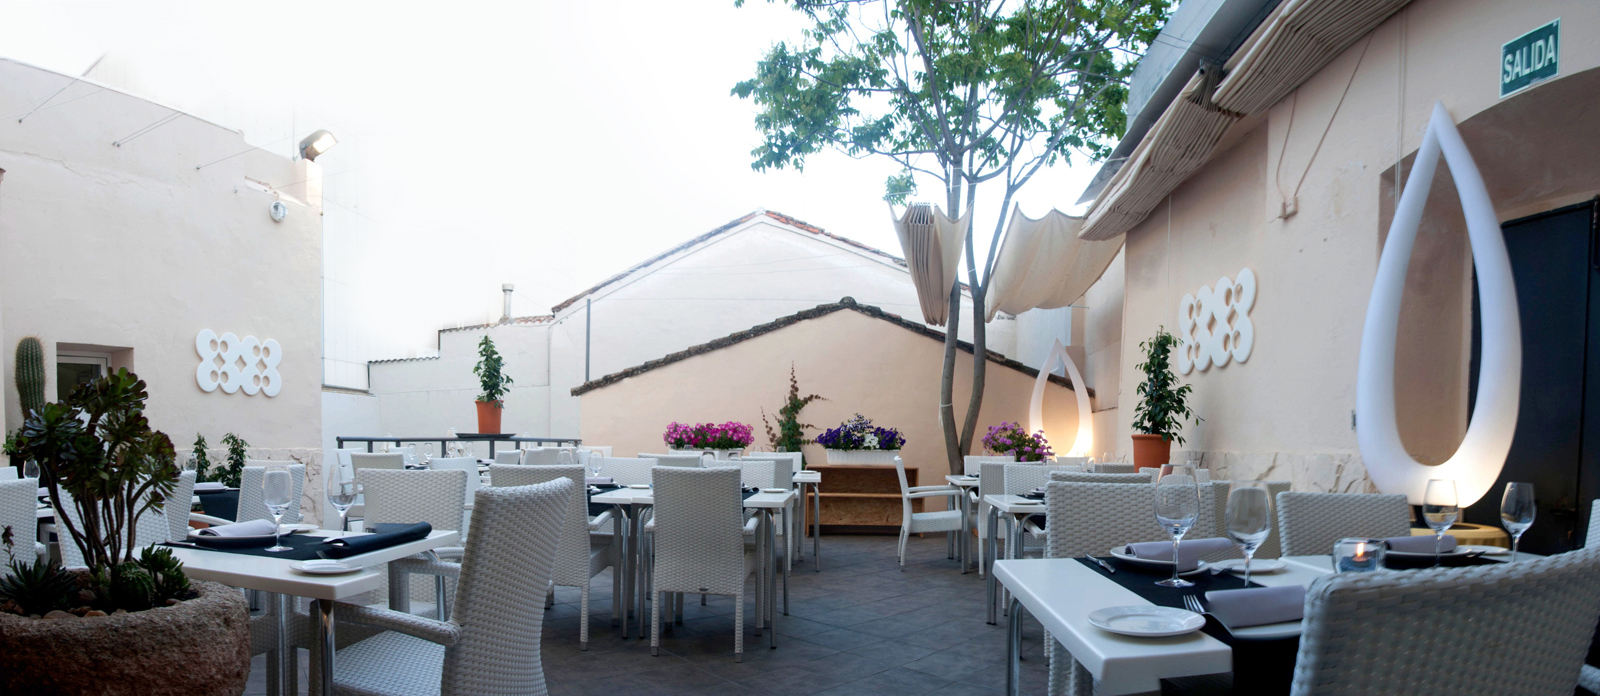 Banner-patio2-copia